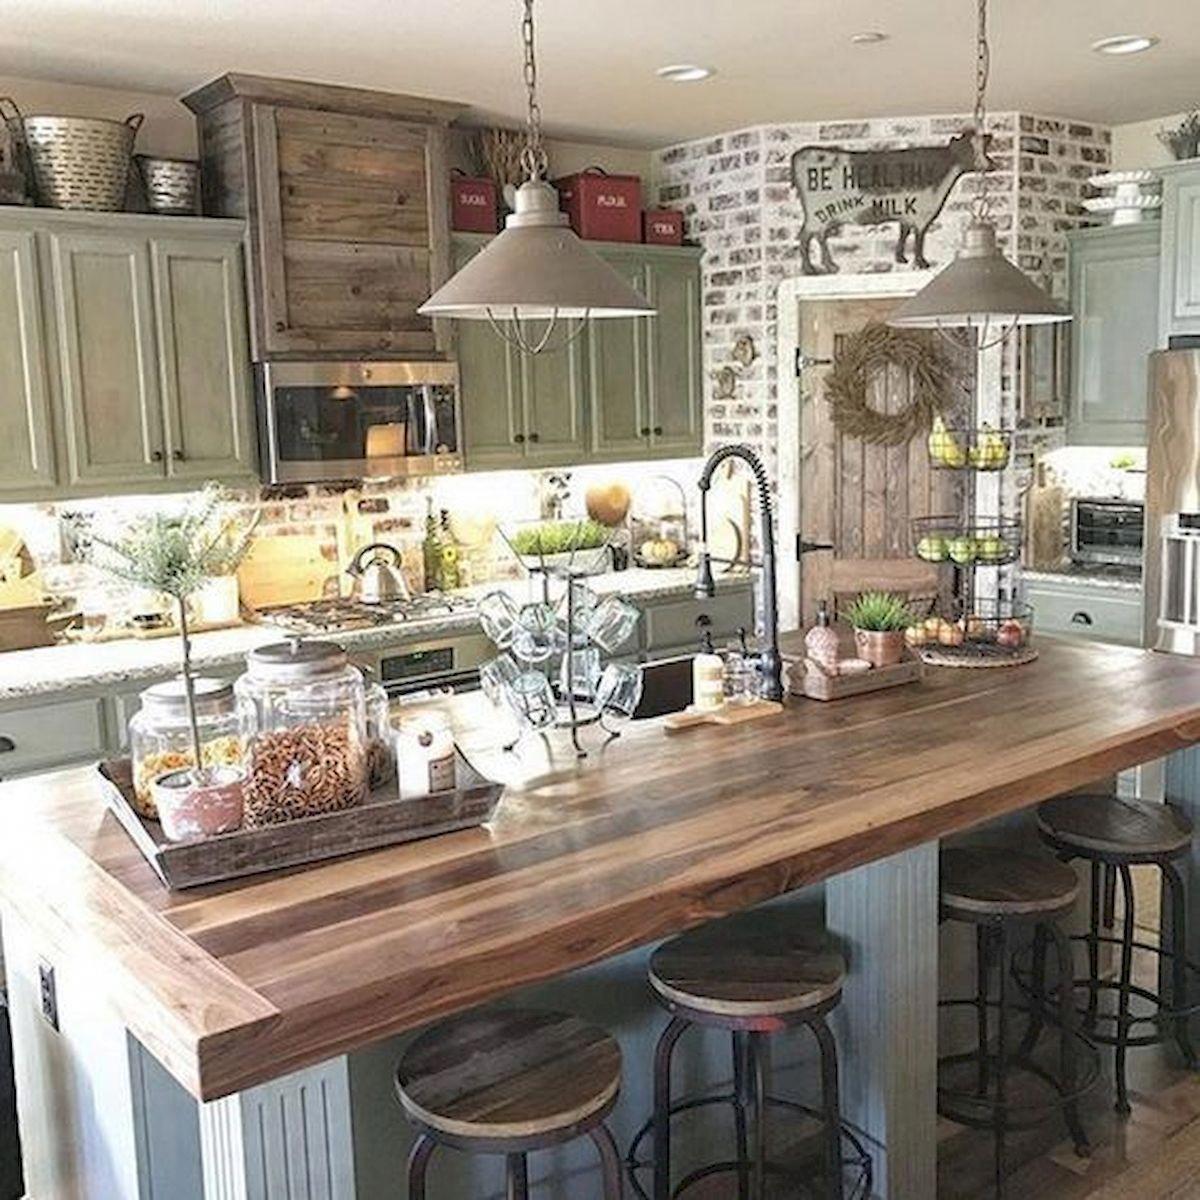 Great Home Design Ideas: 60 Great Farmhouse Kitchen Countertops Design Ideas And